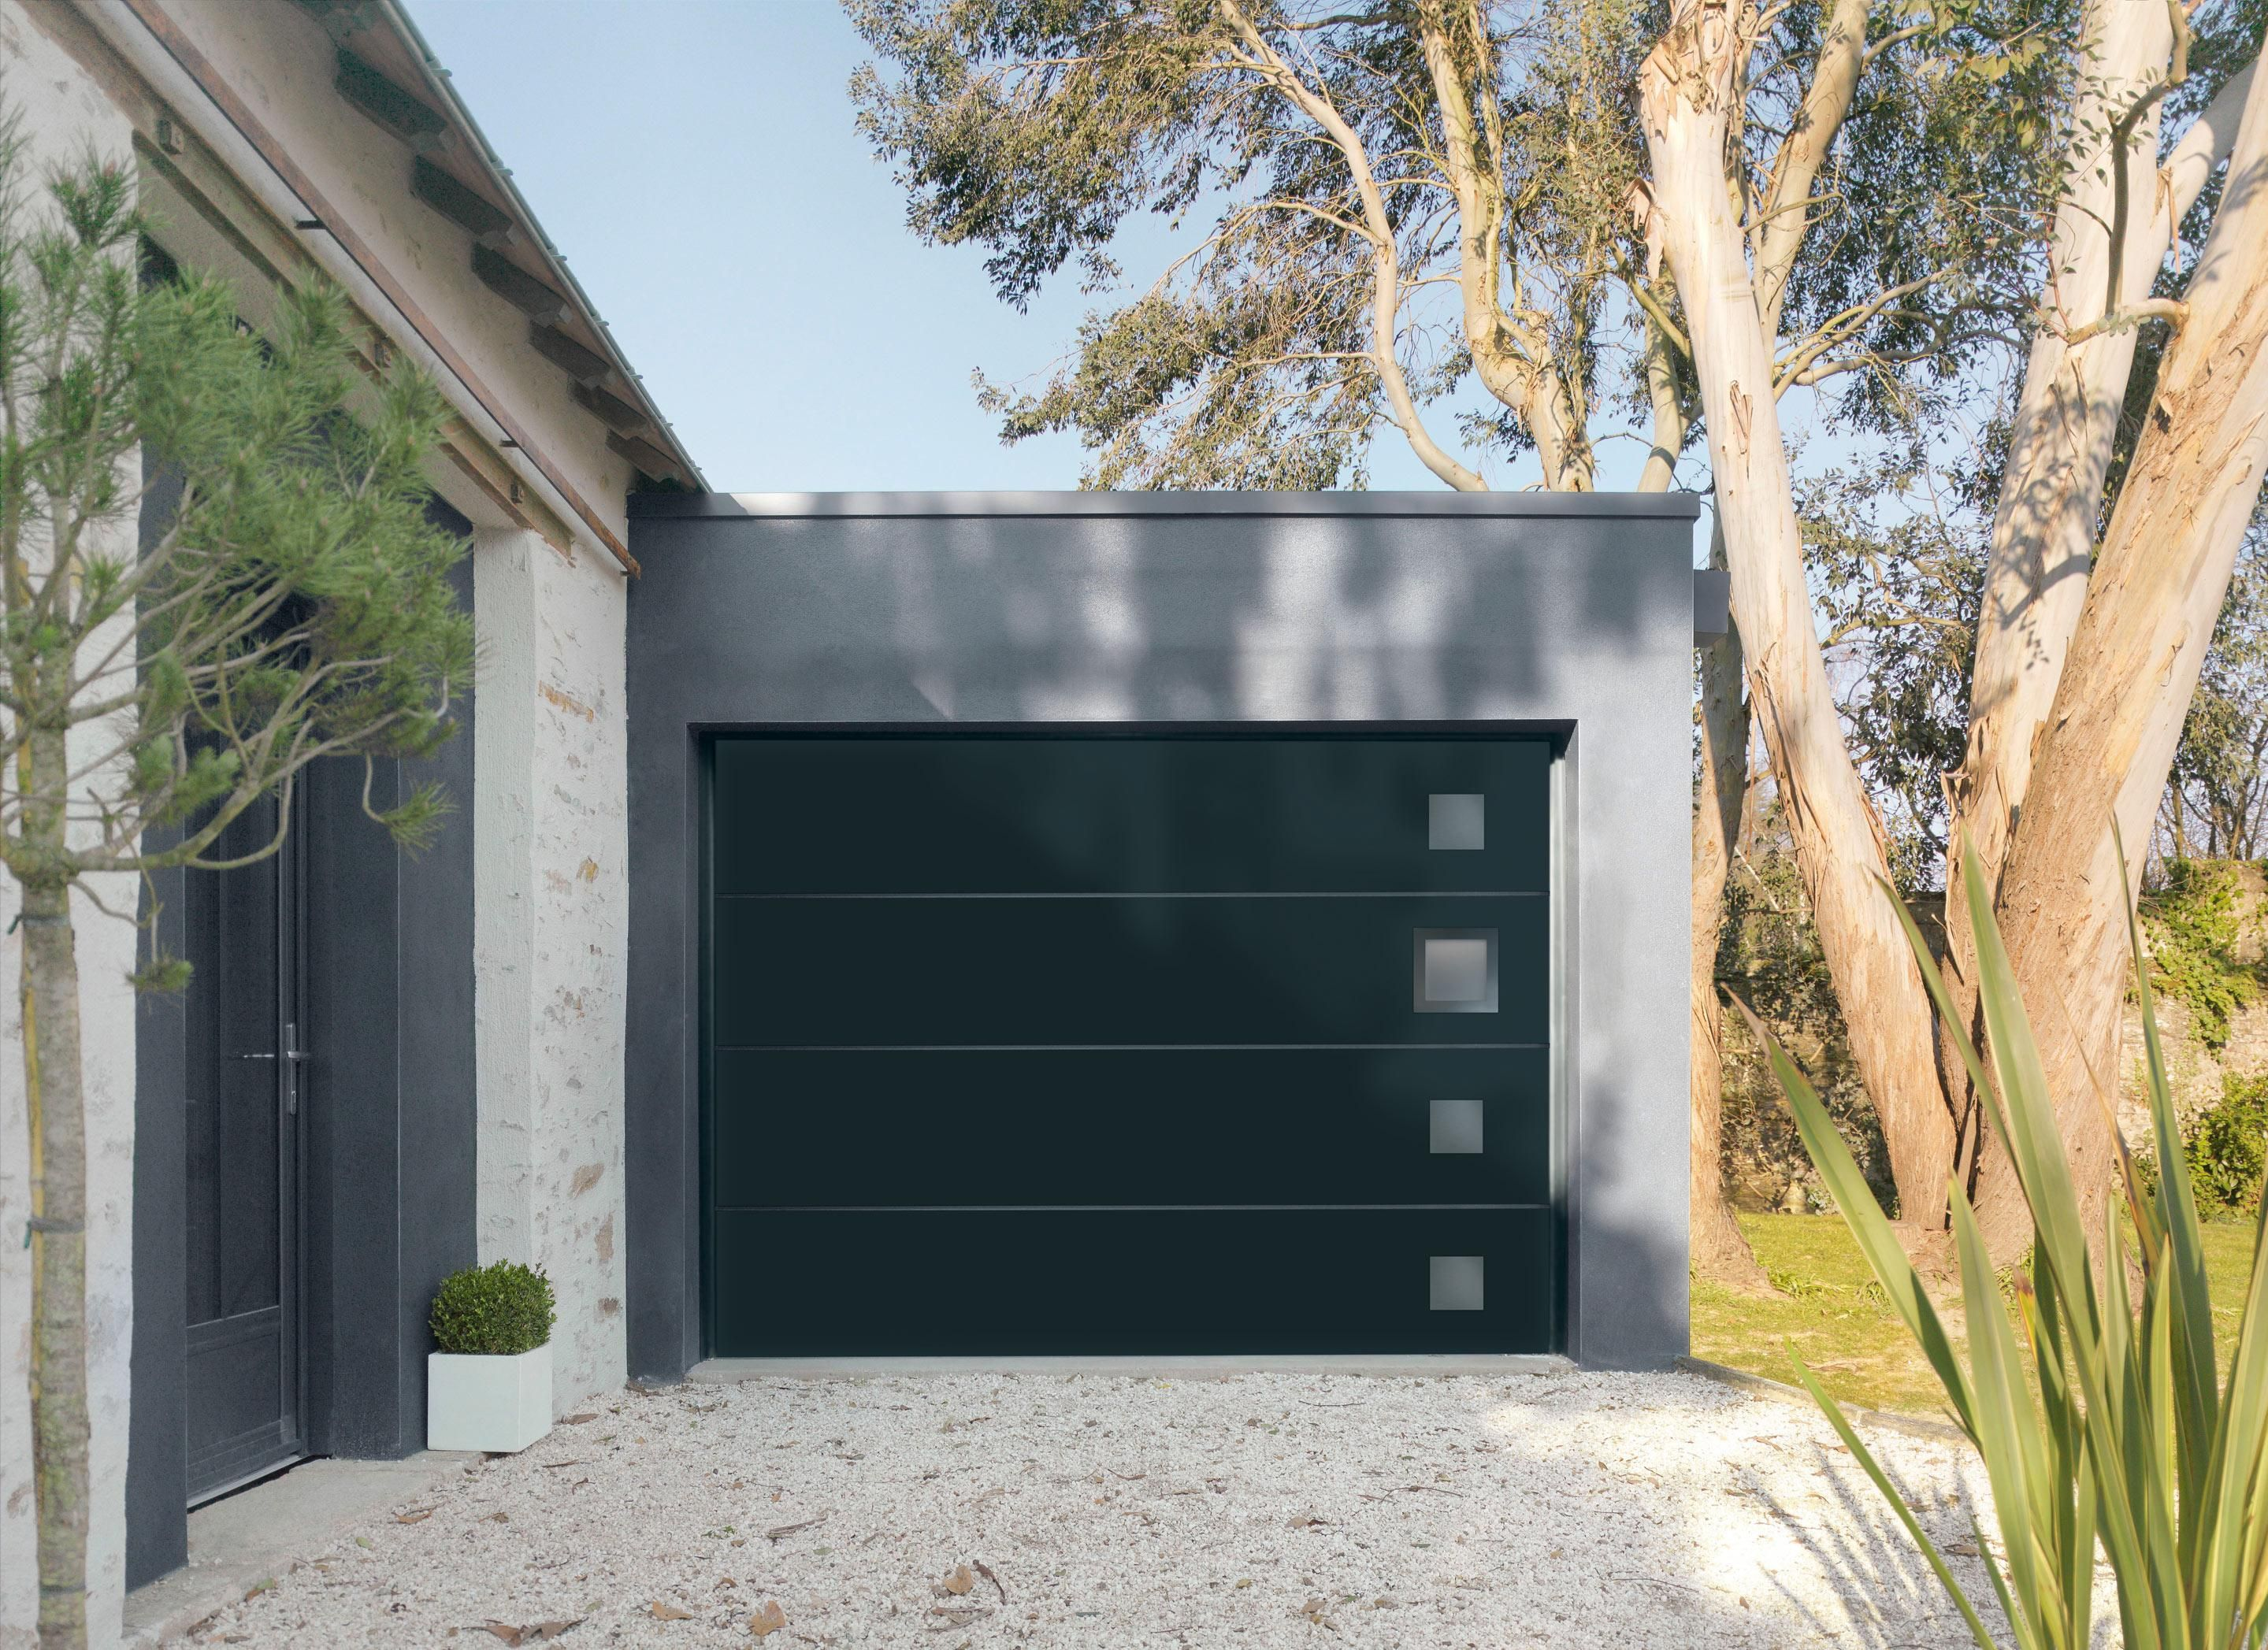 Porte De Garage Sectionnelle Motorisee Artens Premium H 200 X L 240 Cm Porte De Garage Sectionnelle Porte Garage Et Garage